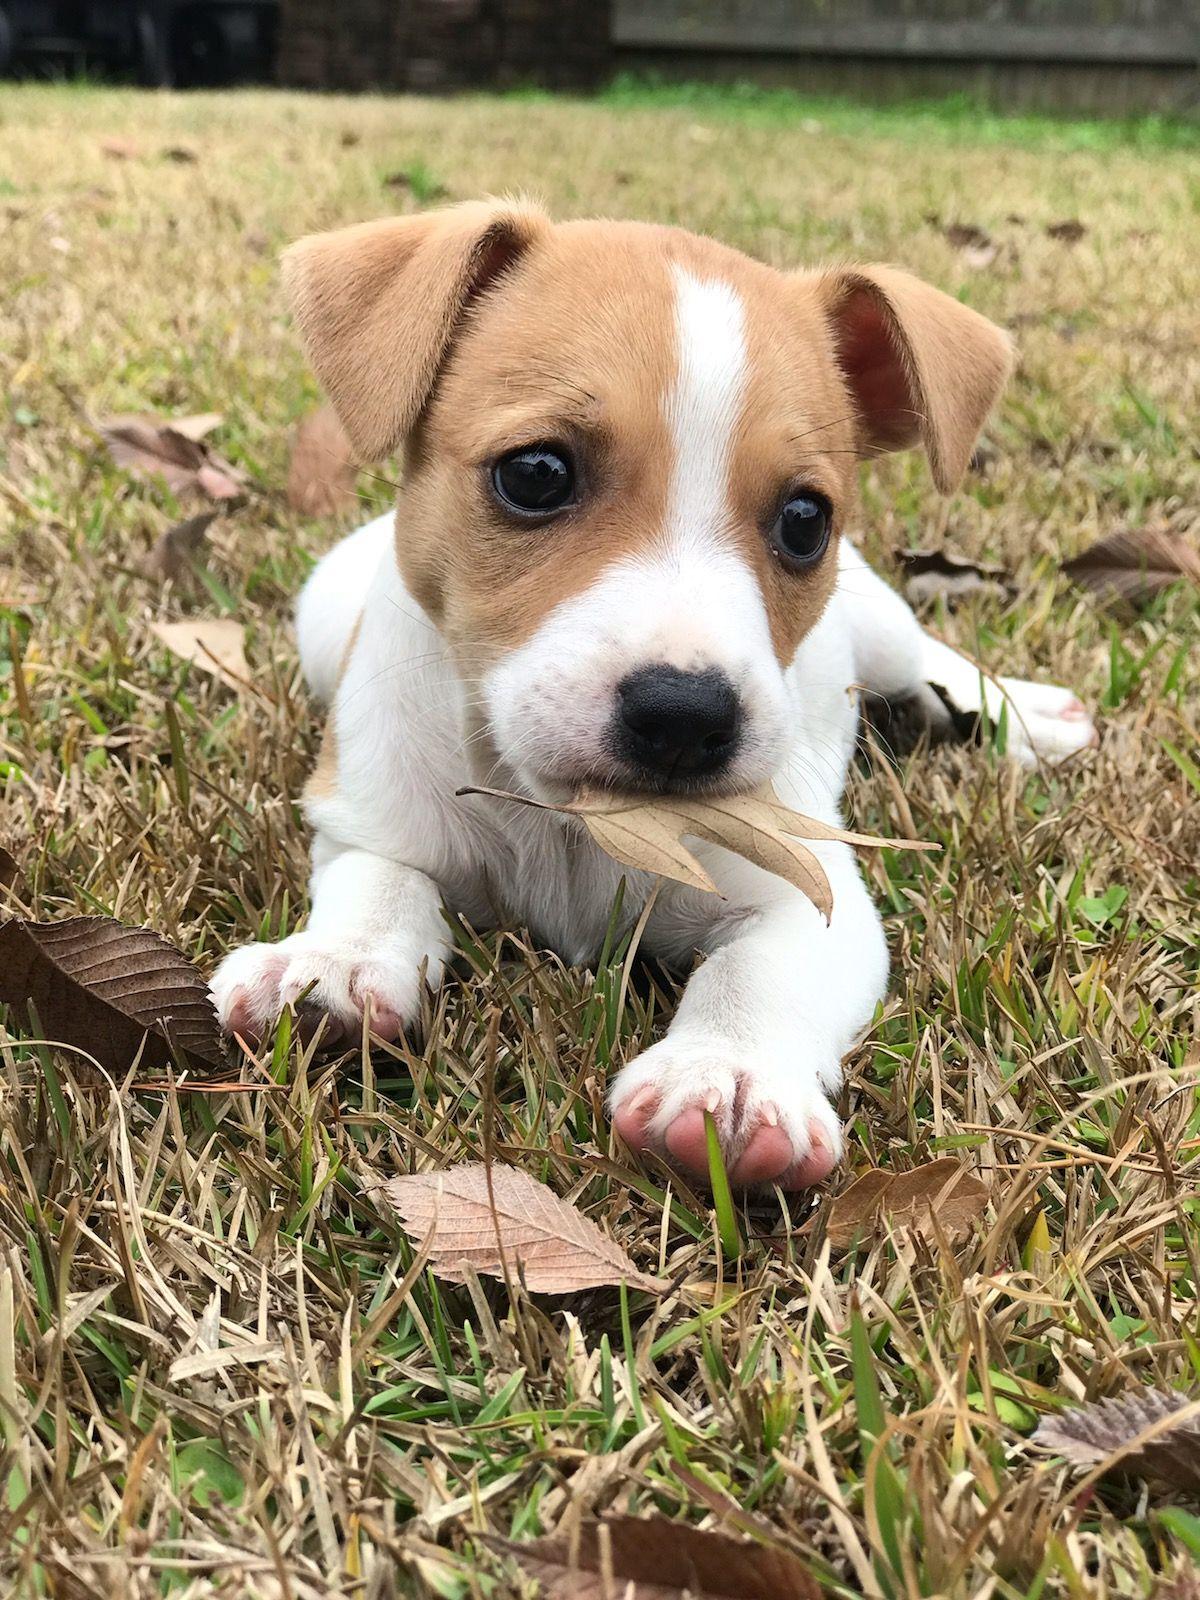 Jack Russell Puppies Jack Russell Puppies Jack Russell